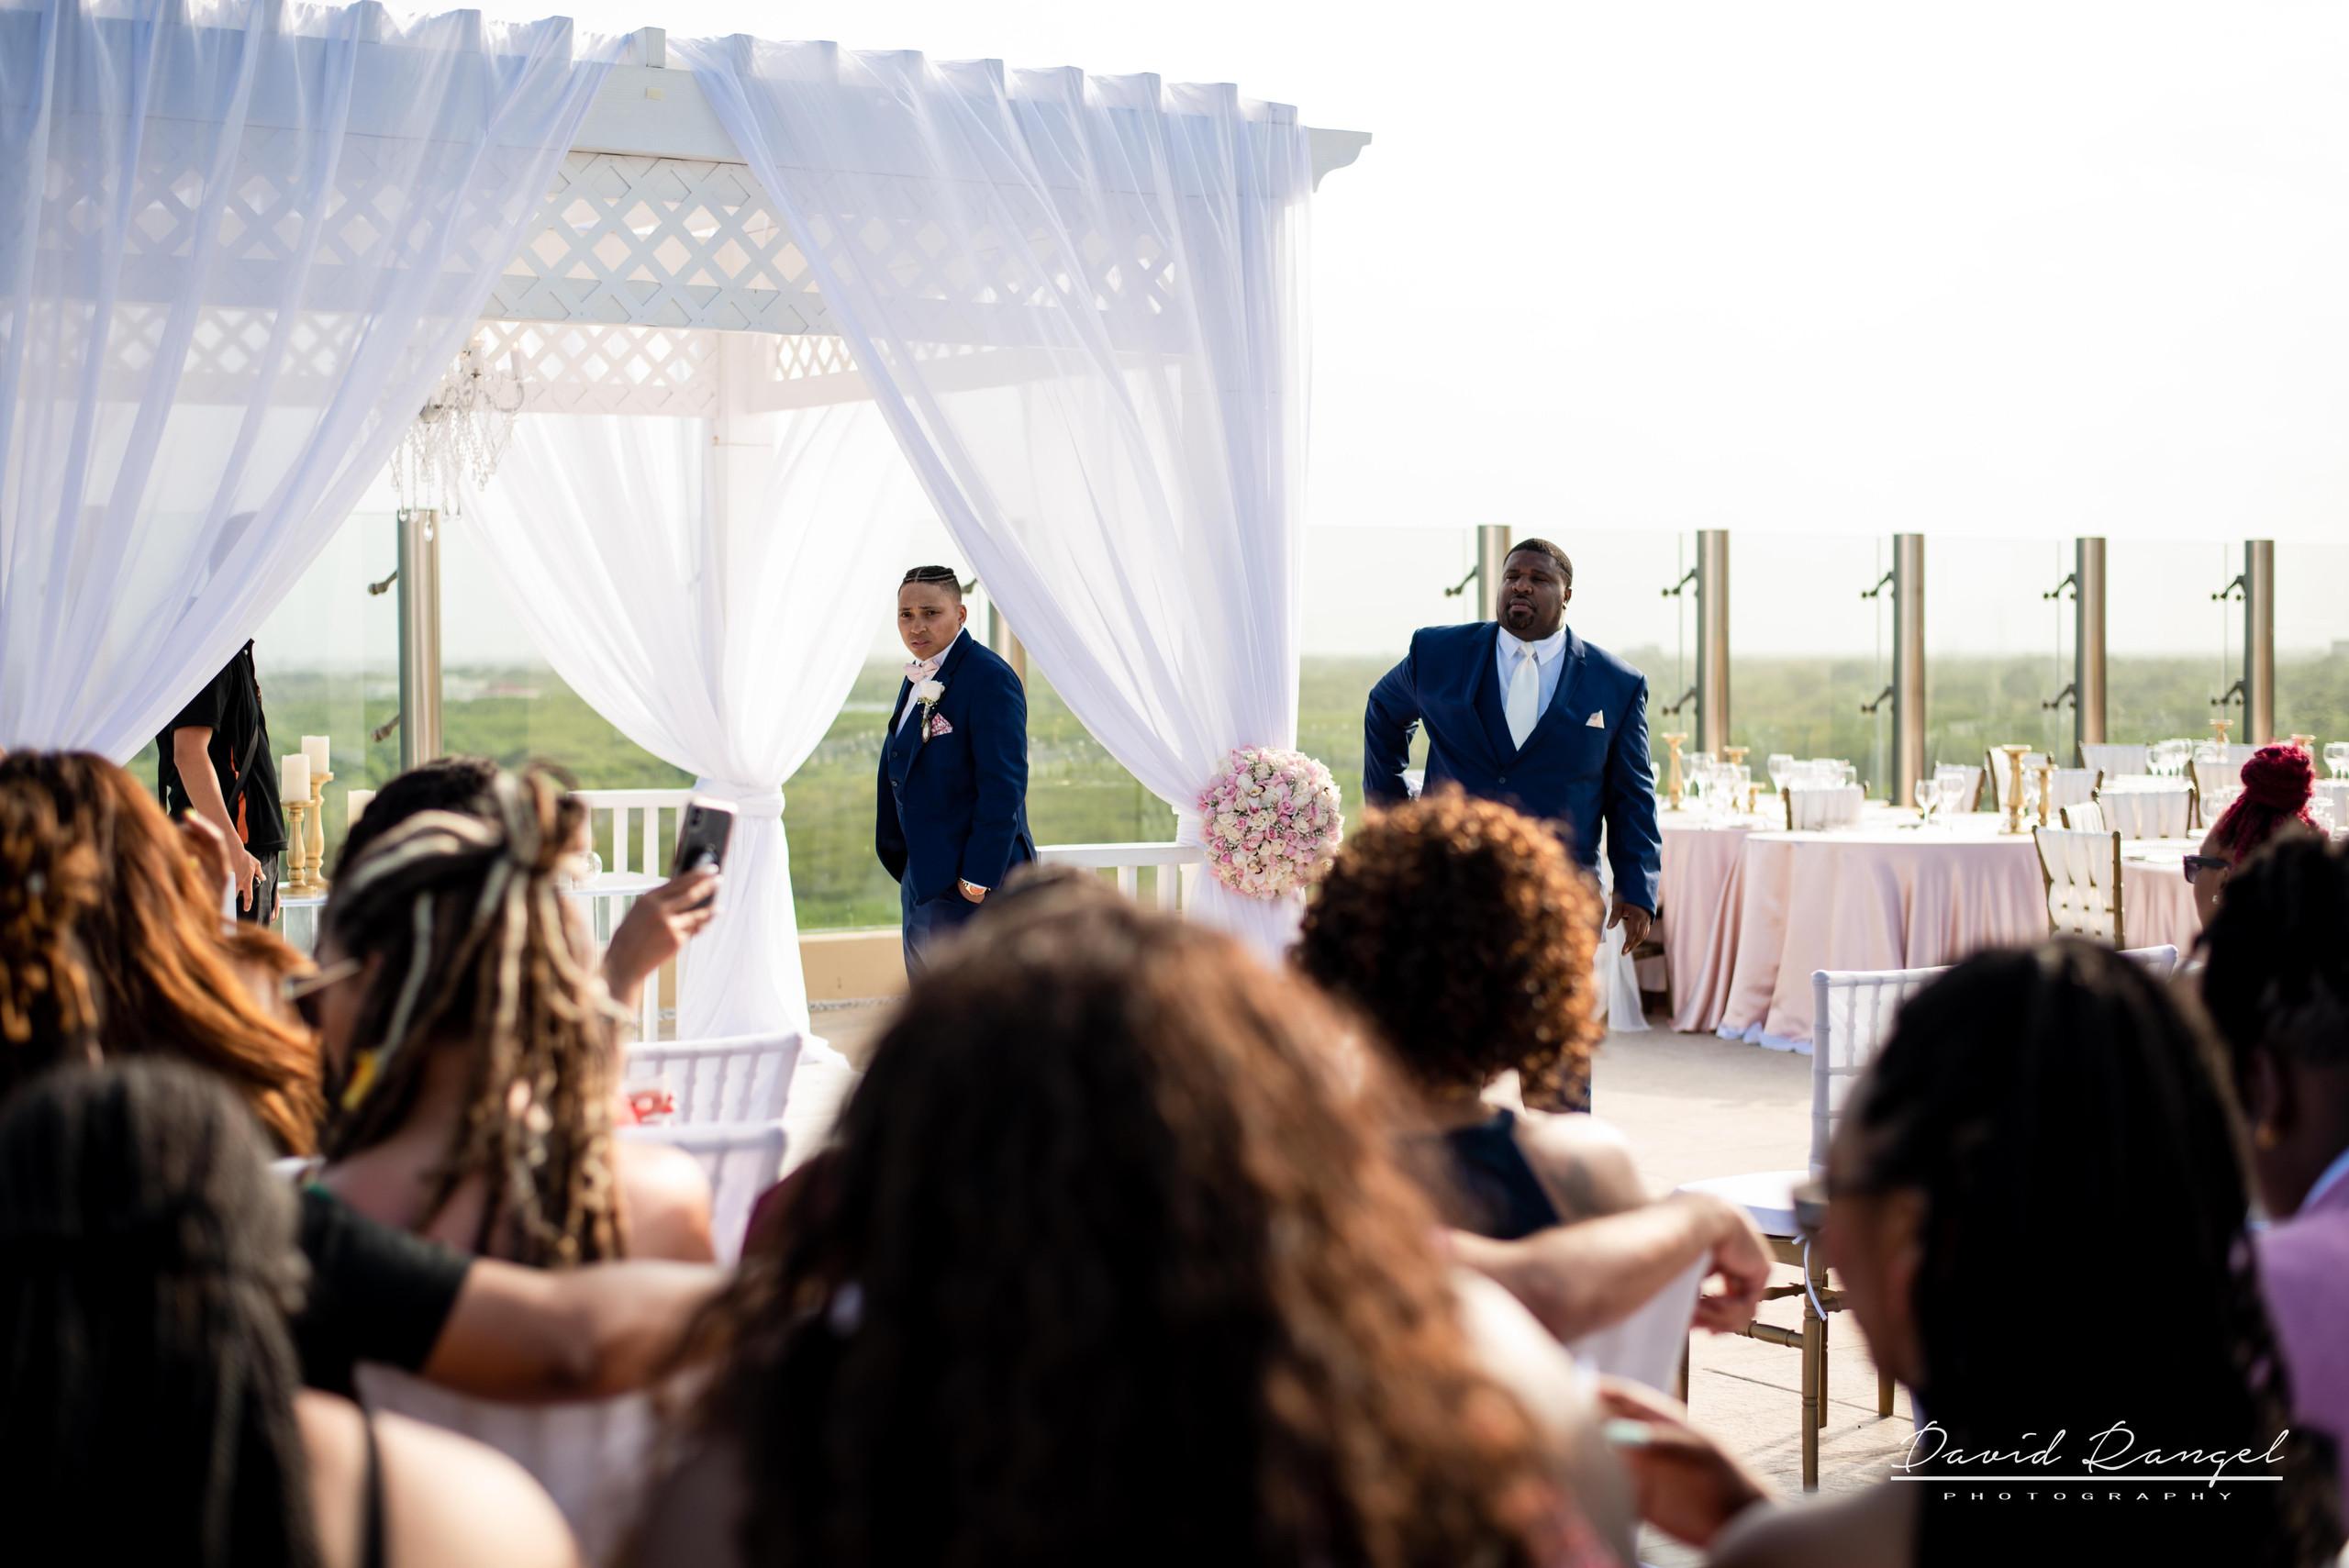 wedding+ceremony+guest